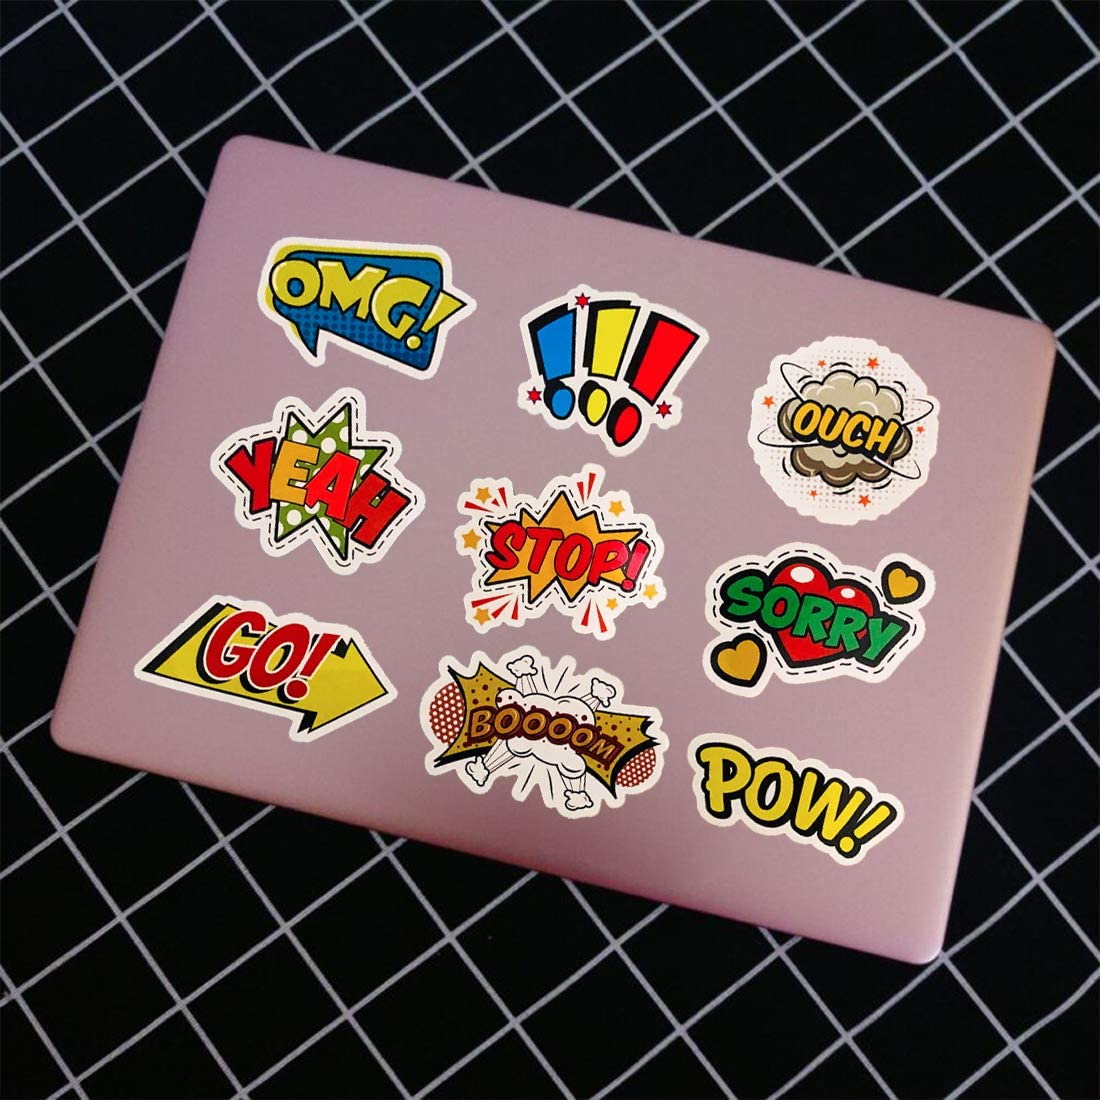 Surprise Alphabet Laptop Stickers Vinyl for Water Bottle Skateboard Guitar Suitcase Door Motorcycle Car Party Bags Phone Case DIY Decoration ...